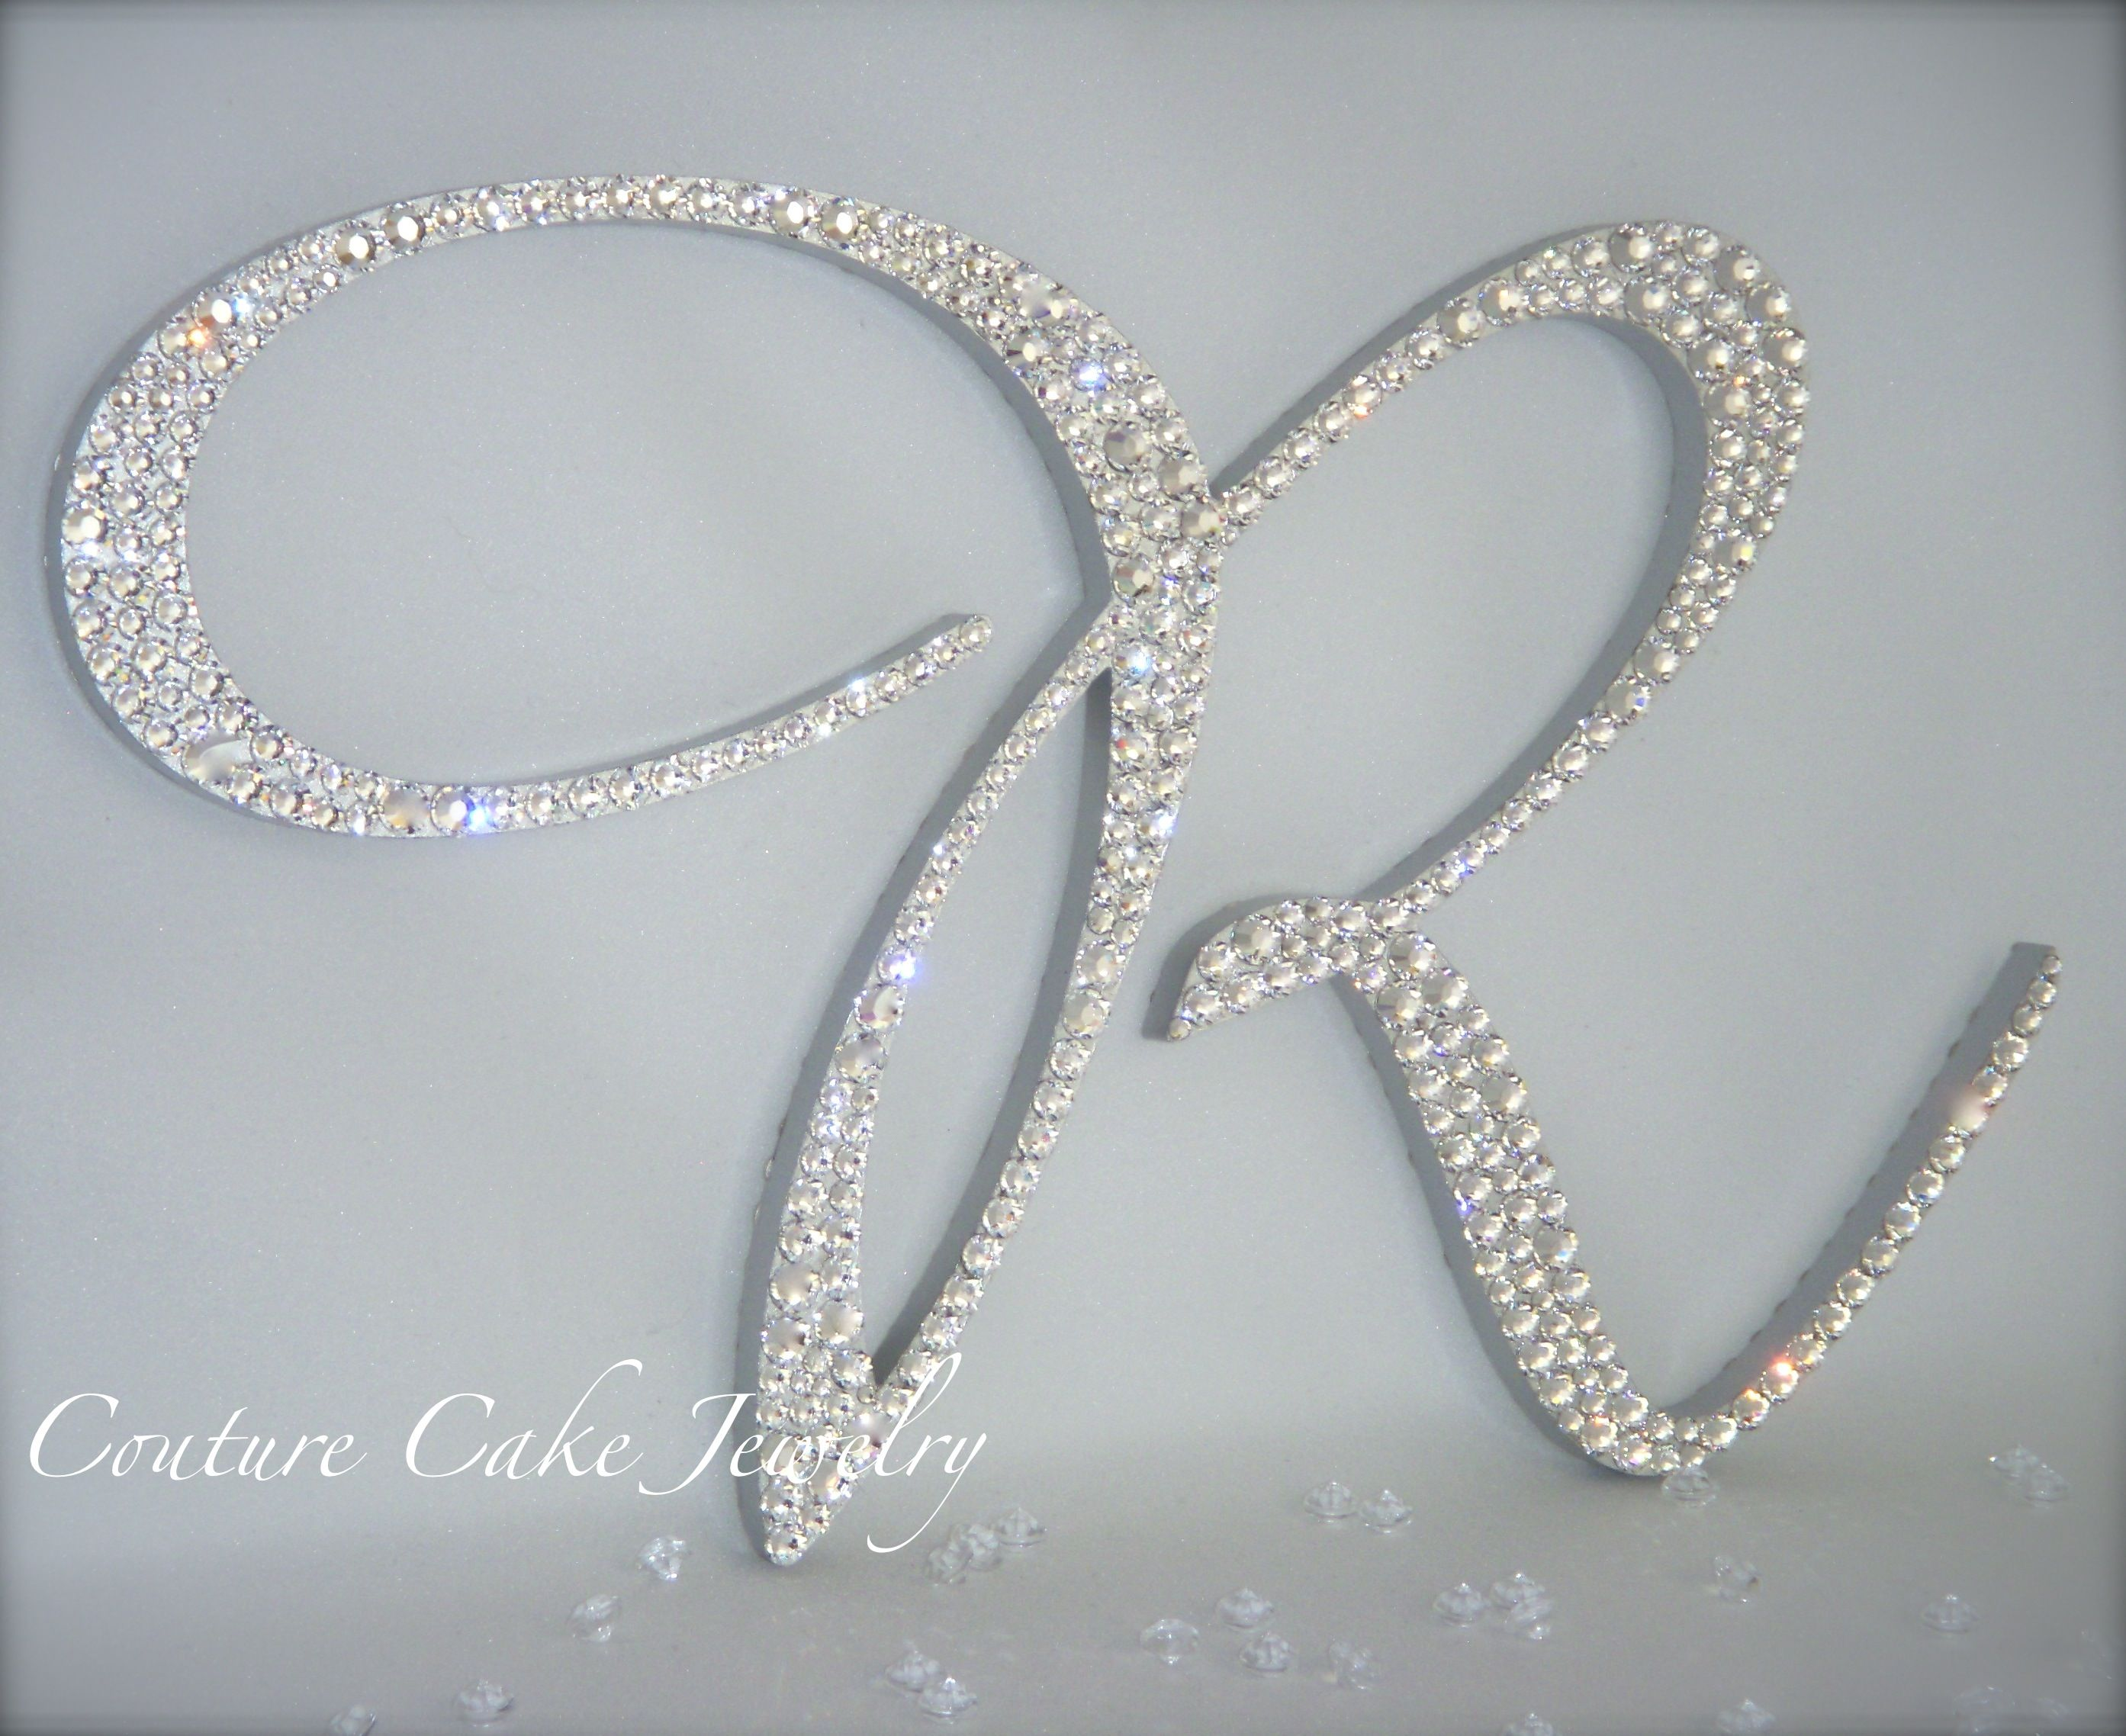 Crystal Monogram Cake Topper shown with Acrylic Diamond confetti ...